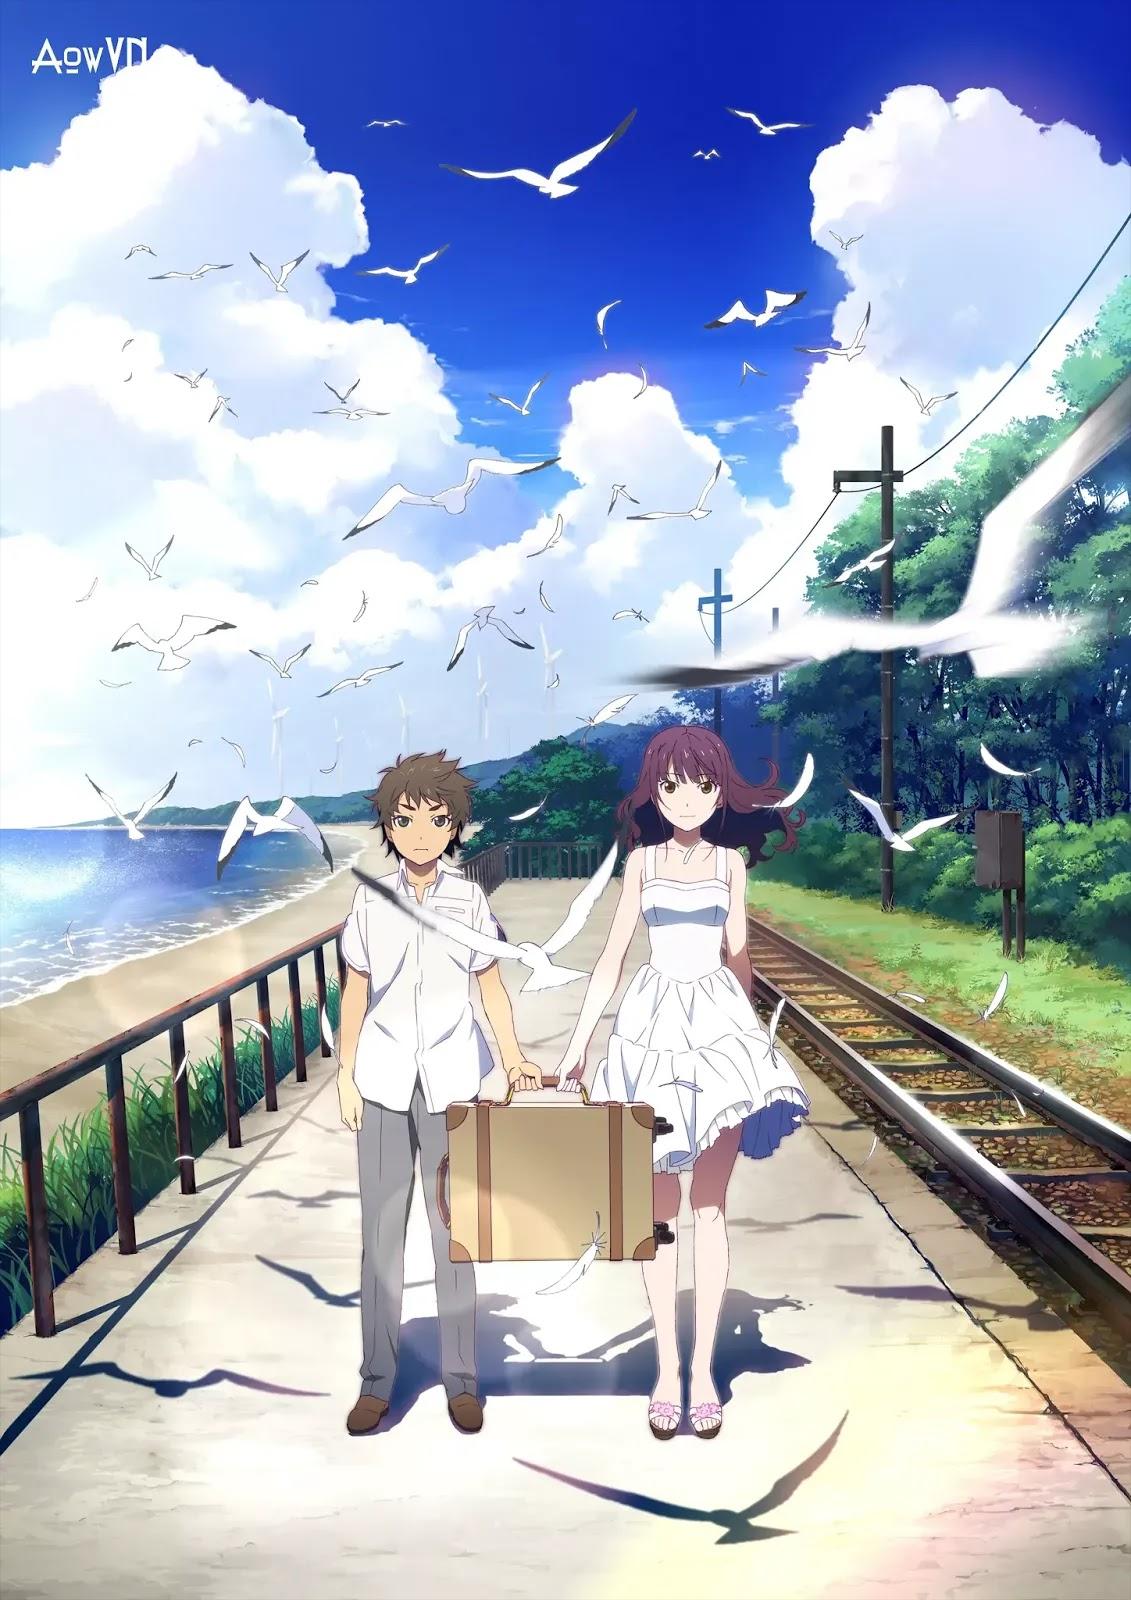 AowVN.org minz%2B%252810%2529 - [ Hình Nền ] Anime Uchiage Hanabi Shita Kara Miru Ka cực đẹp | AowVN Wallpapers